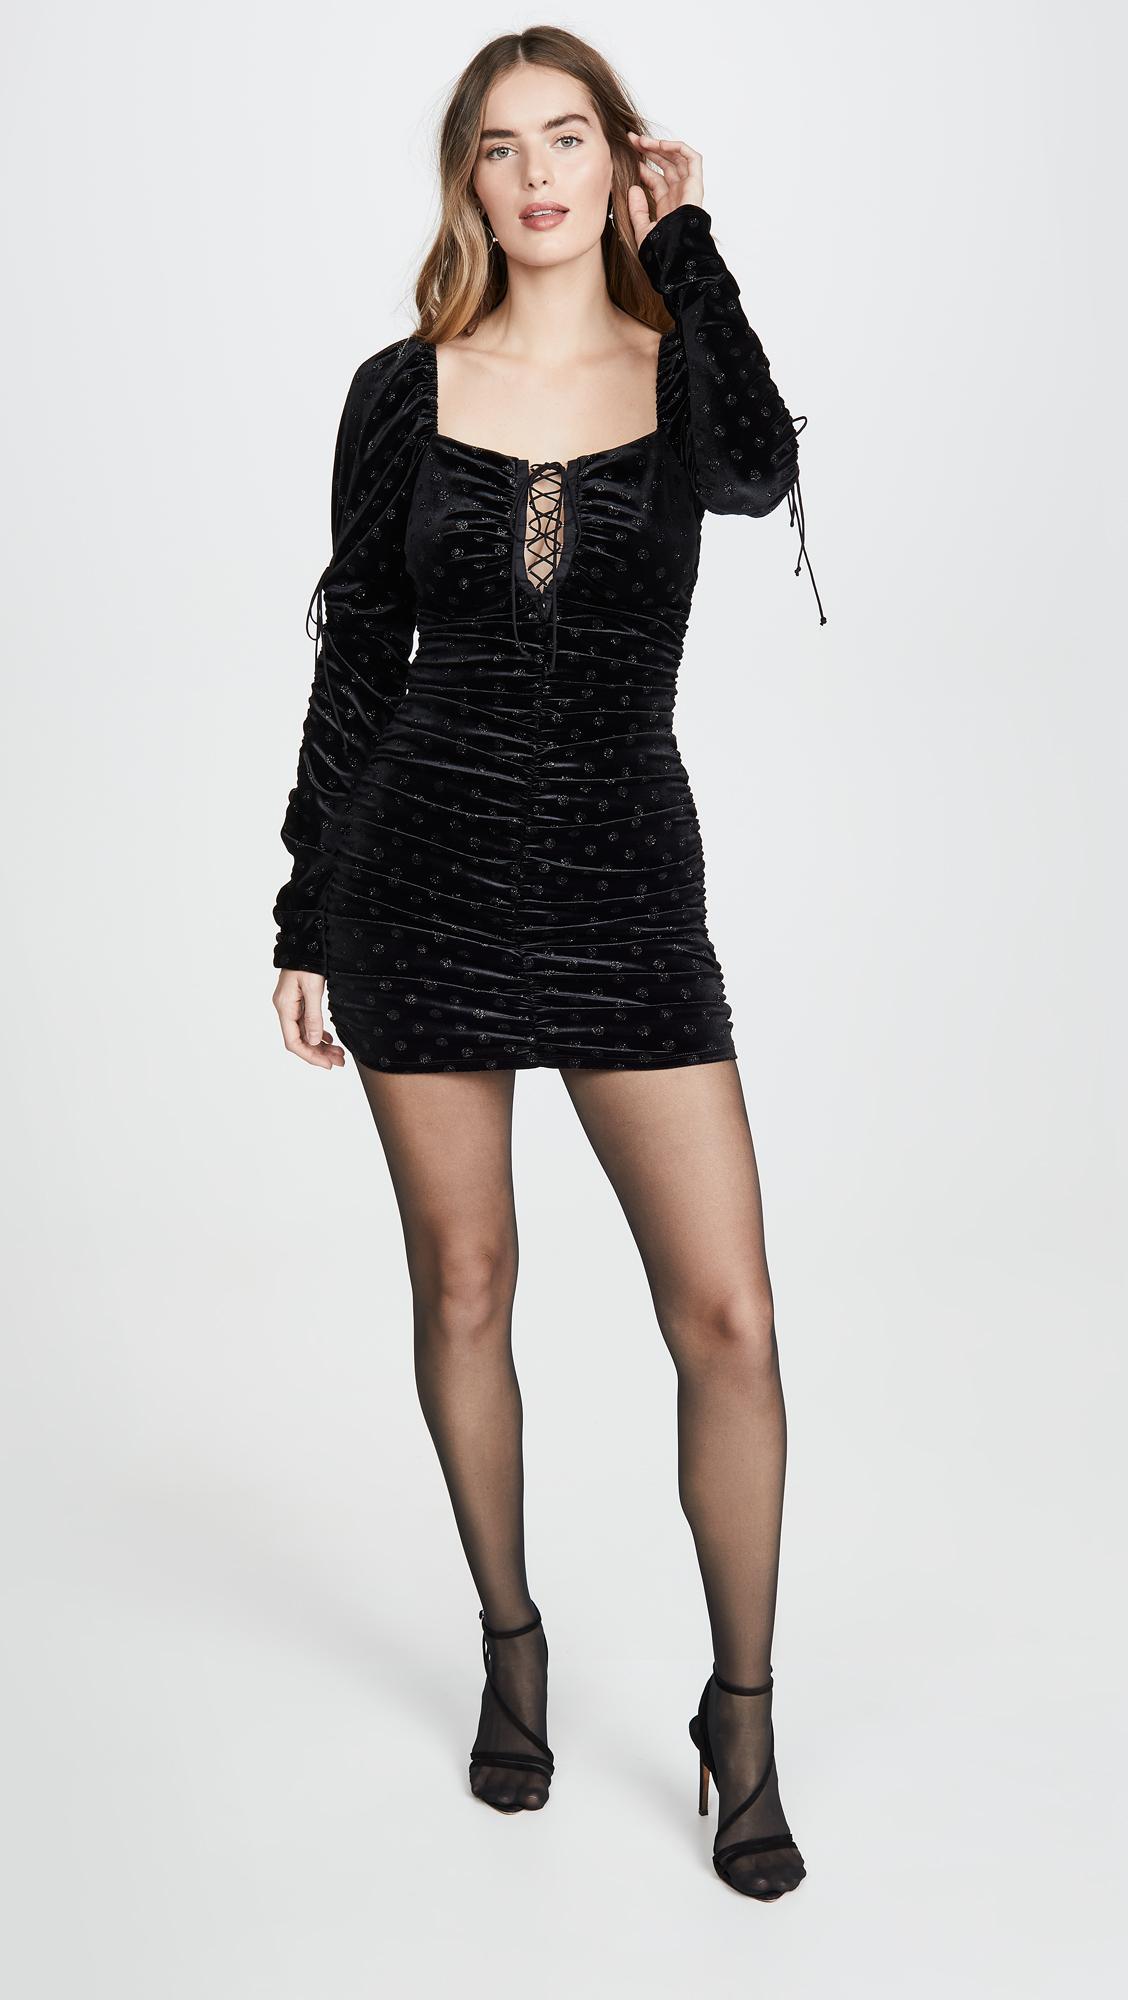 lola p clothing website lola clothing company